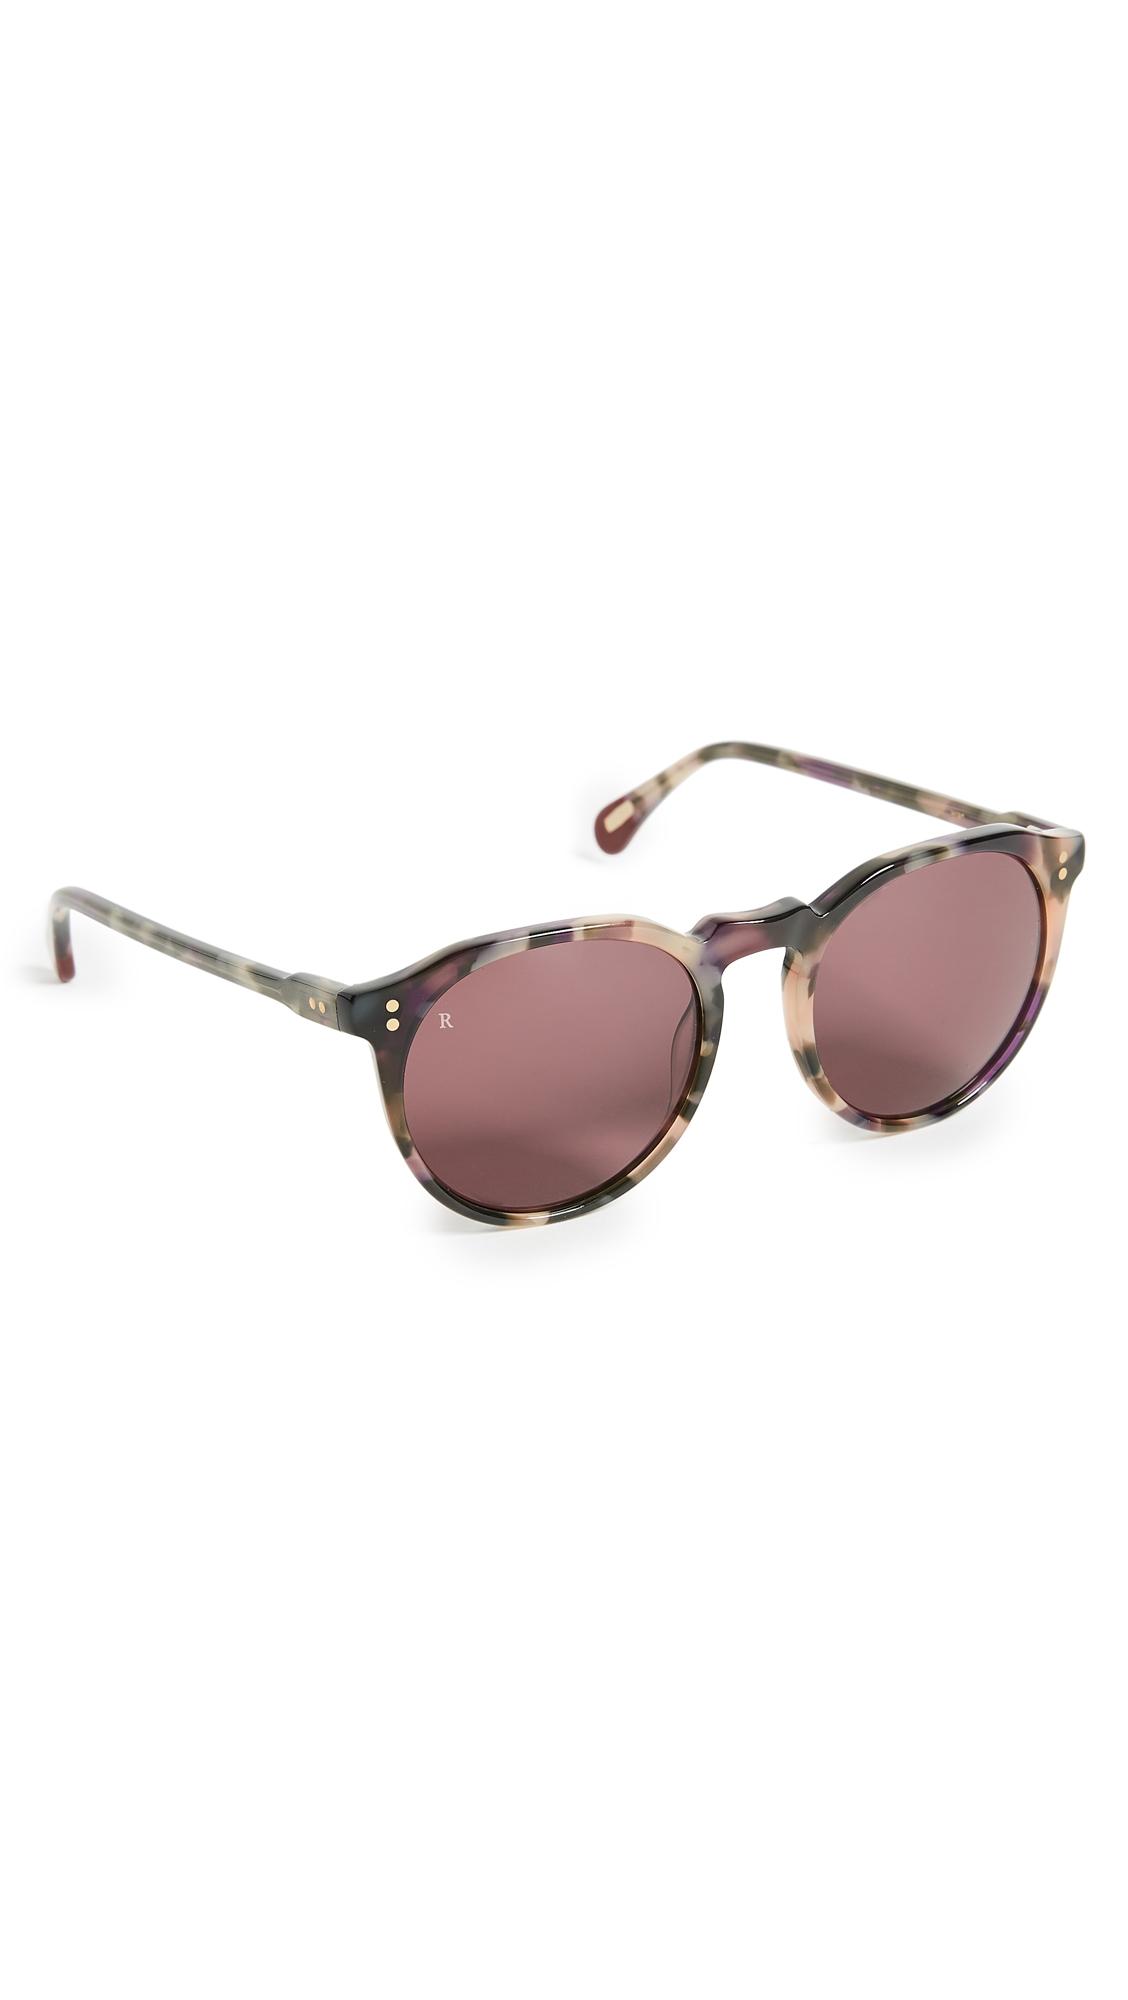 67b64ade5c Raen Remmy 52 Sunglasses In Wren Rose